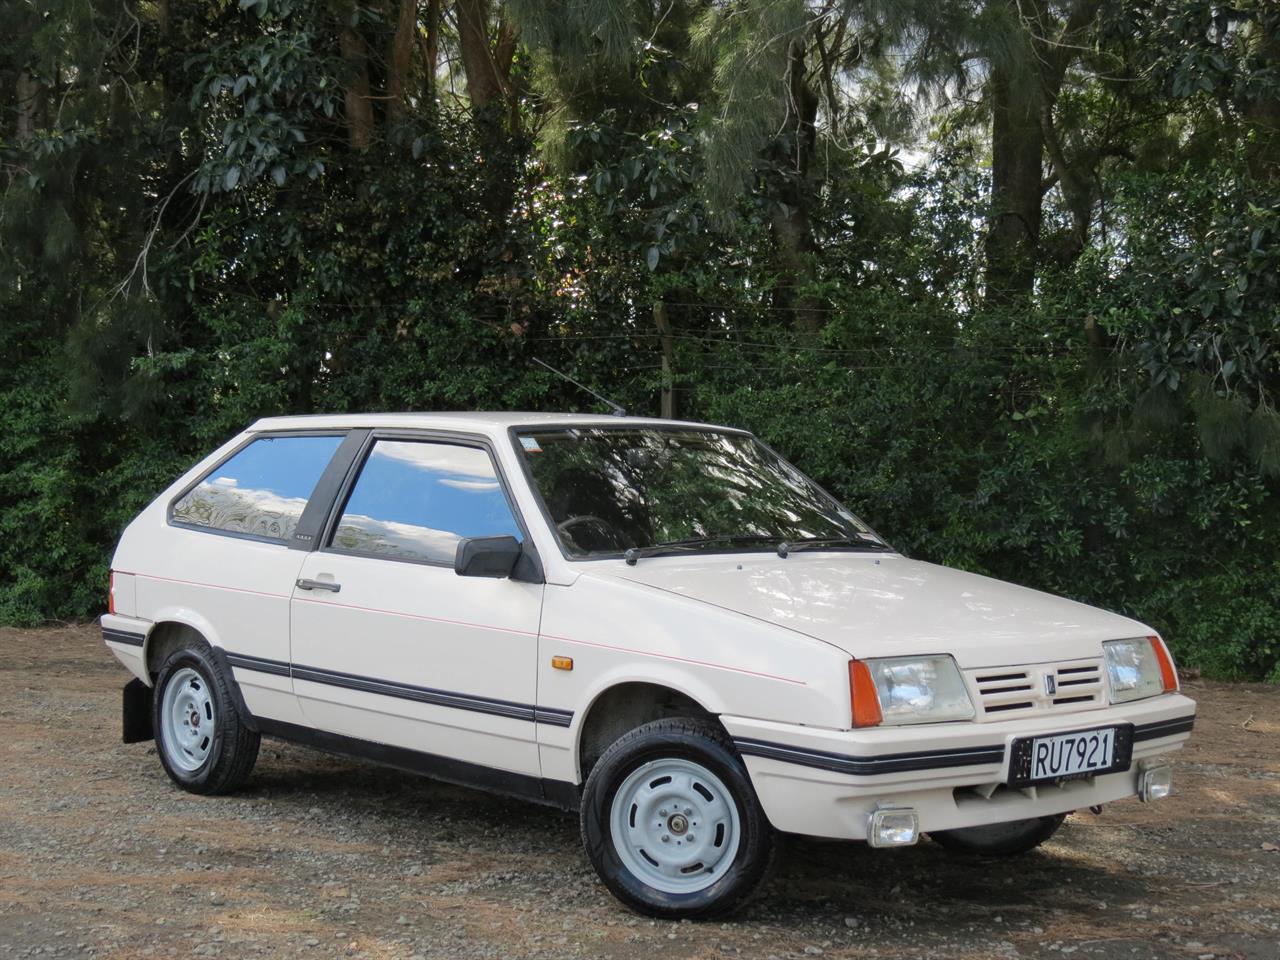 1992 Lada Samara  | only $47 weekly